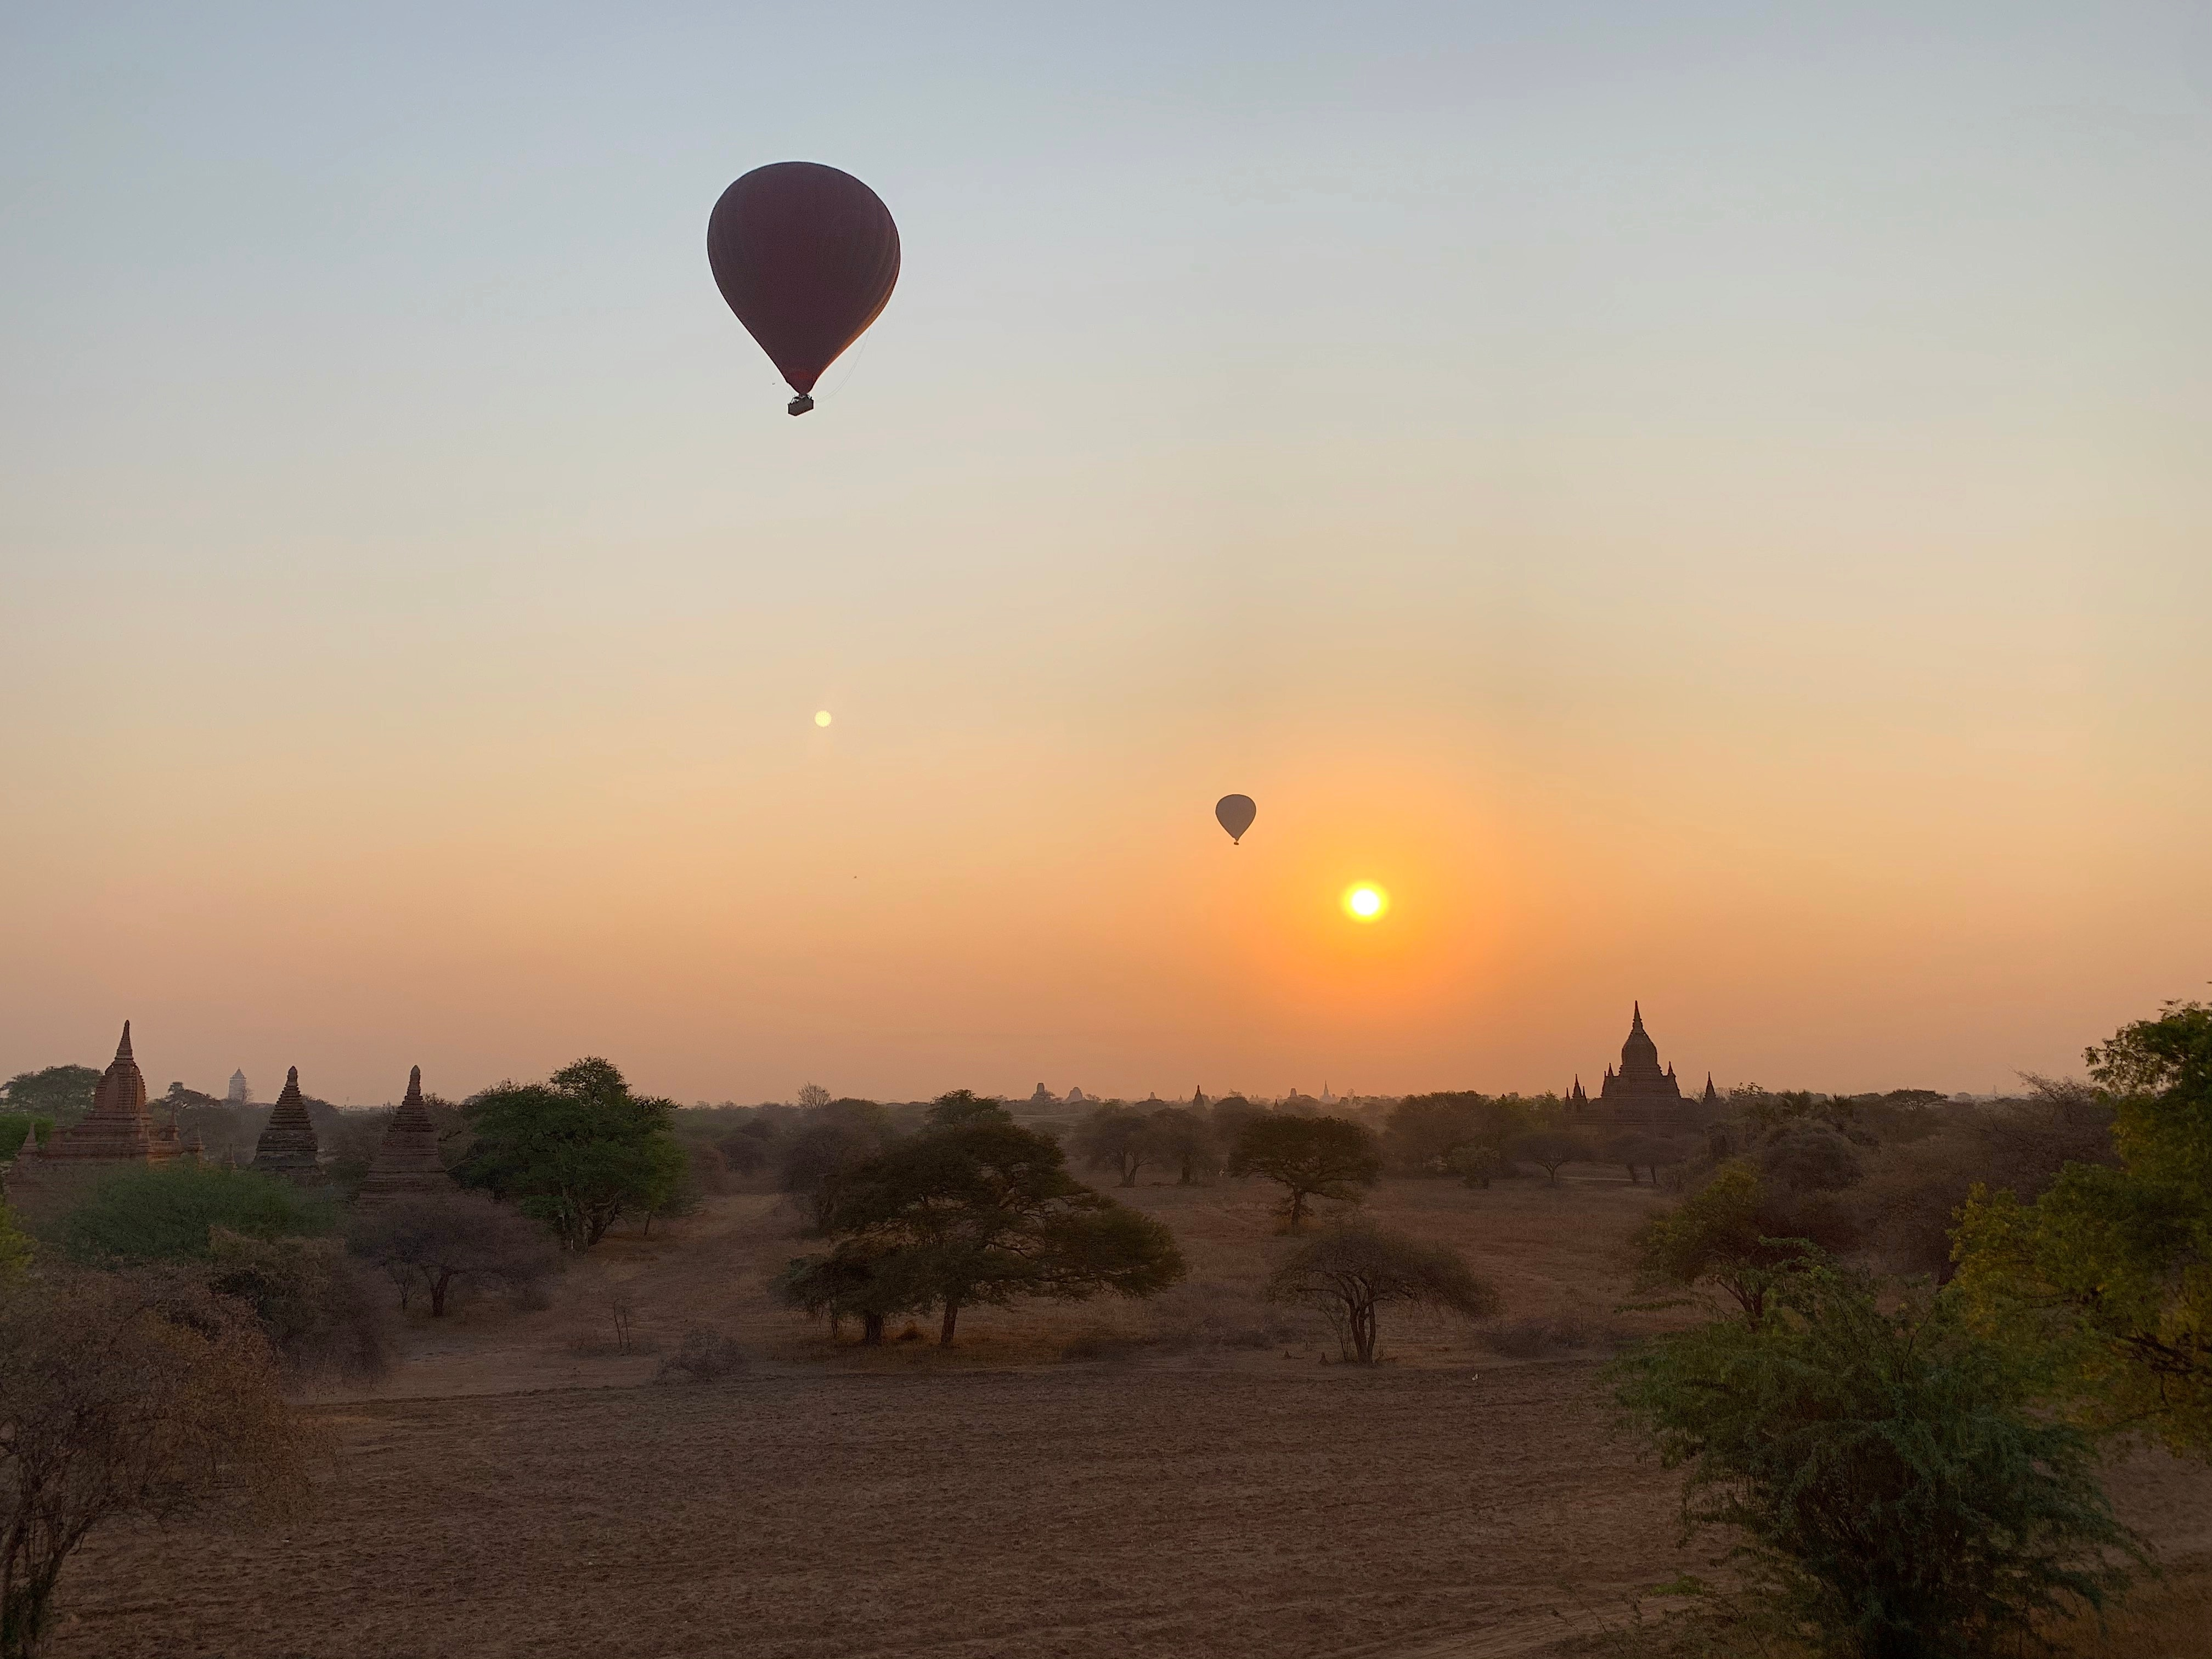 Sonnenaufgang in Bagan mit Heißluftballons